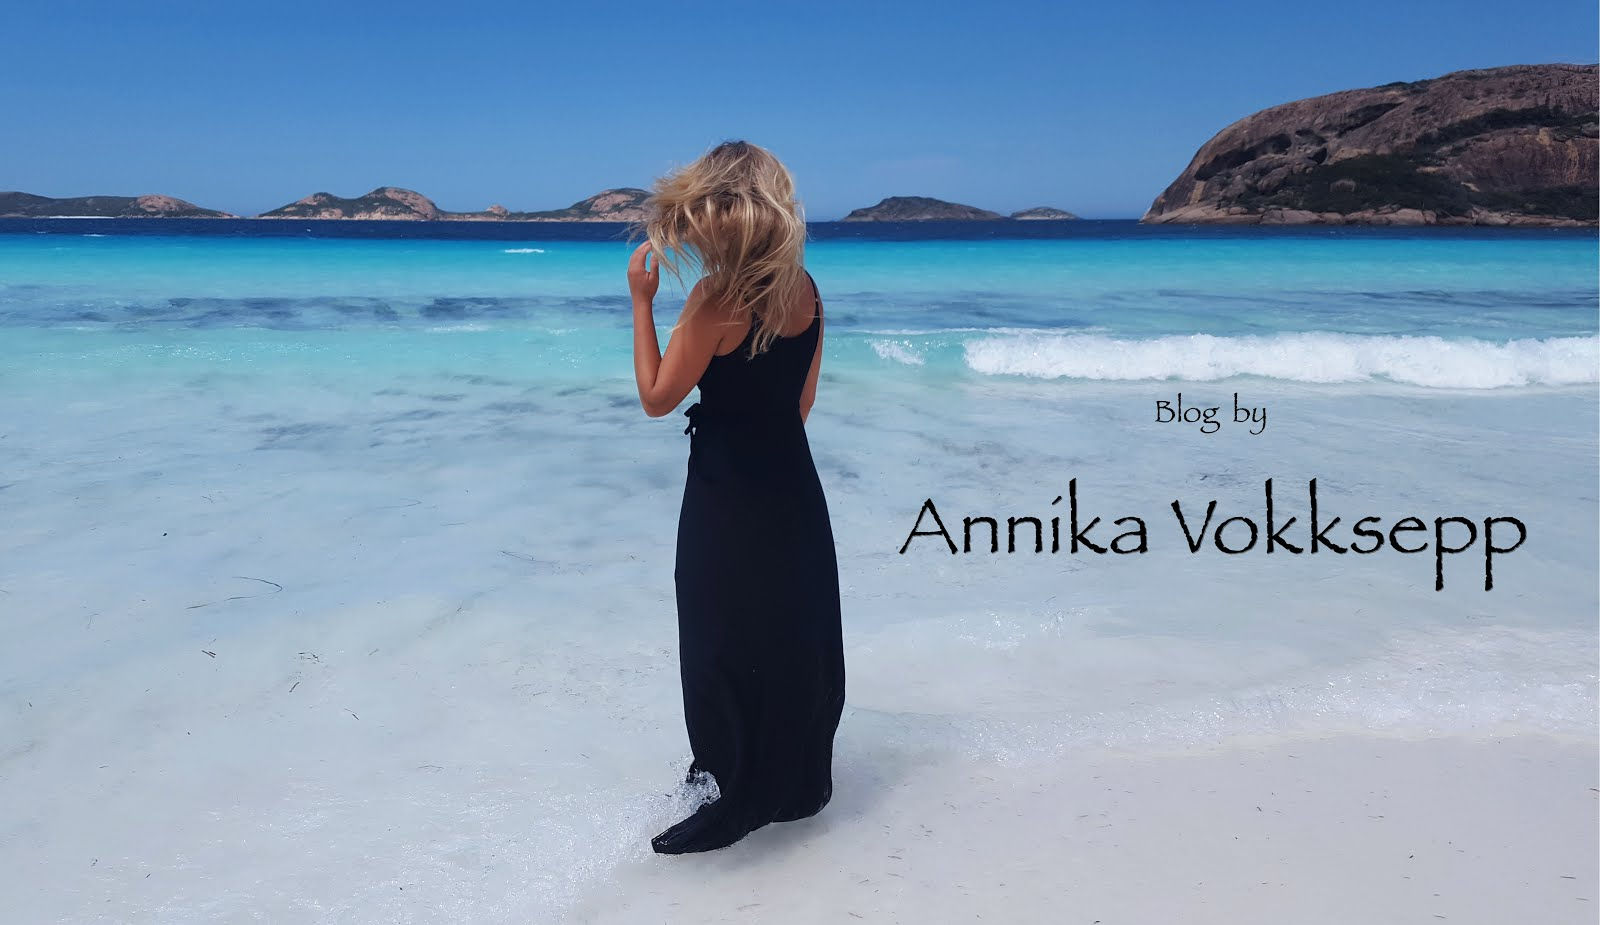 Annika Vokksepp